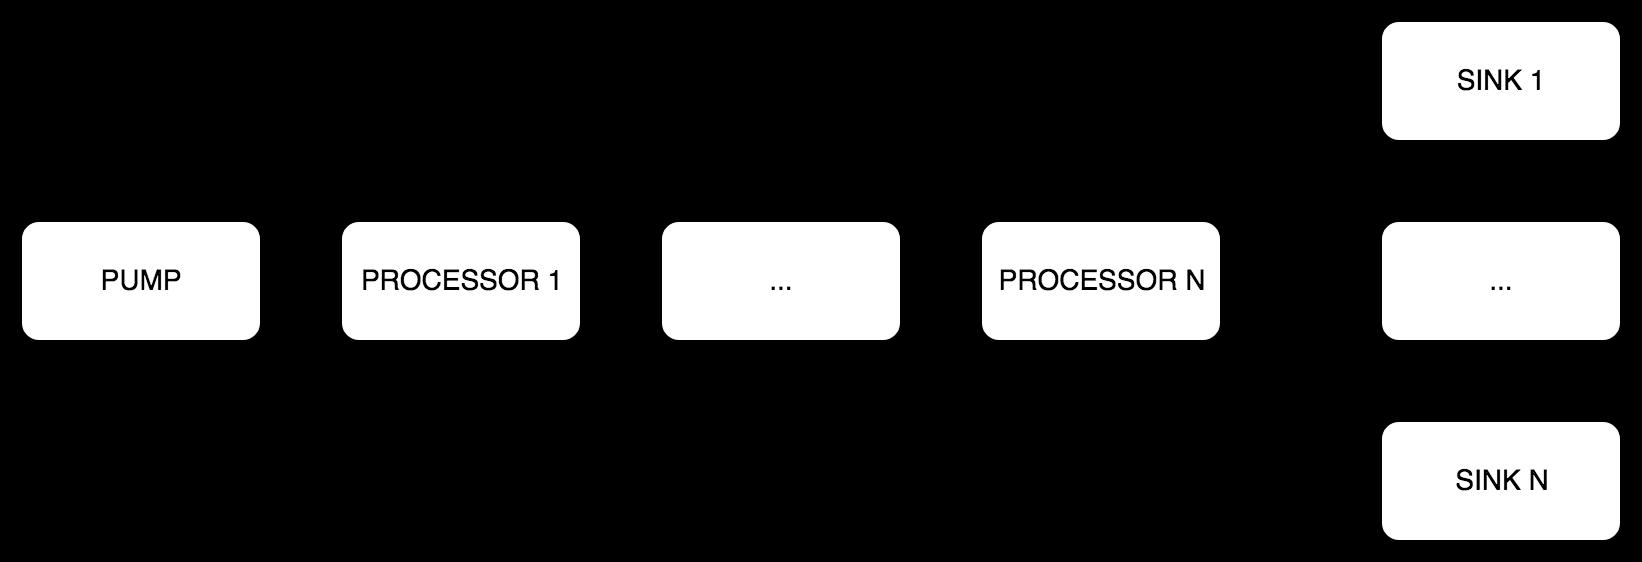 pipe_diagram